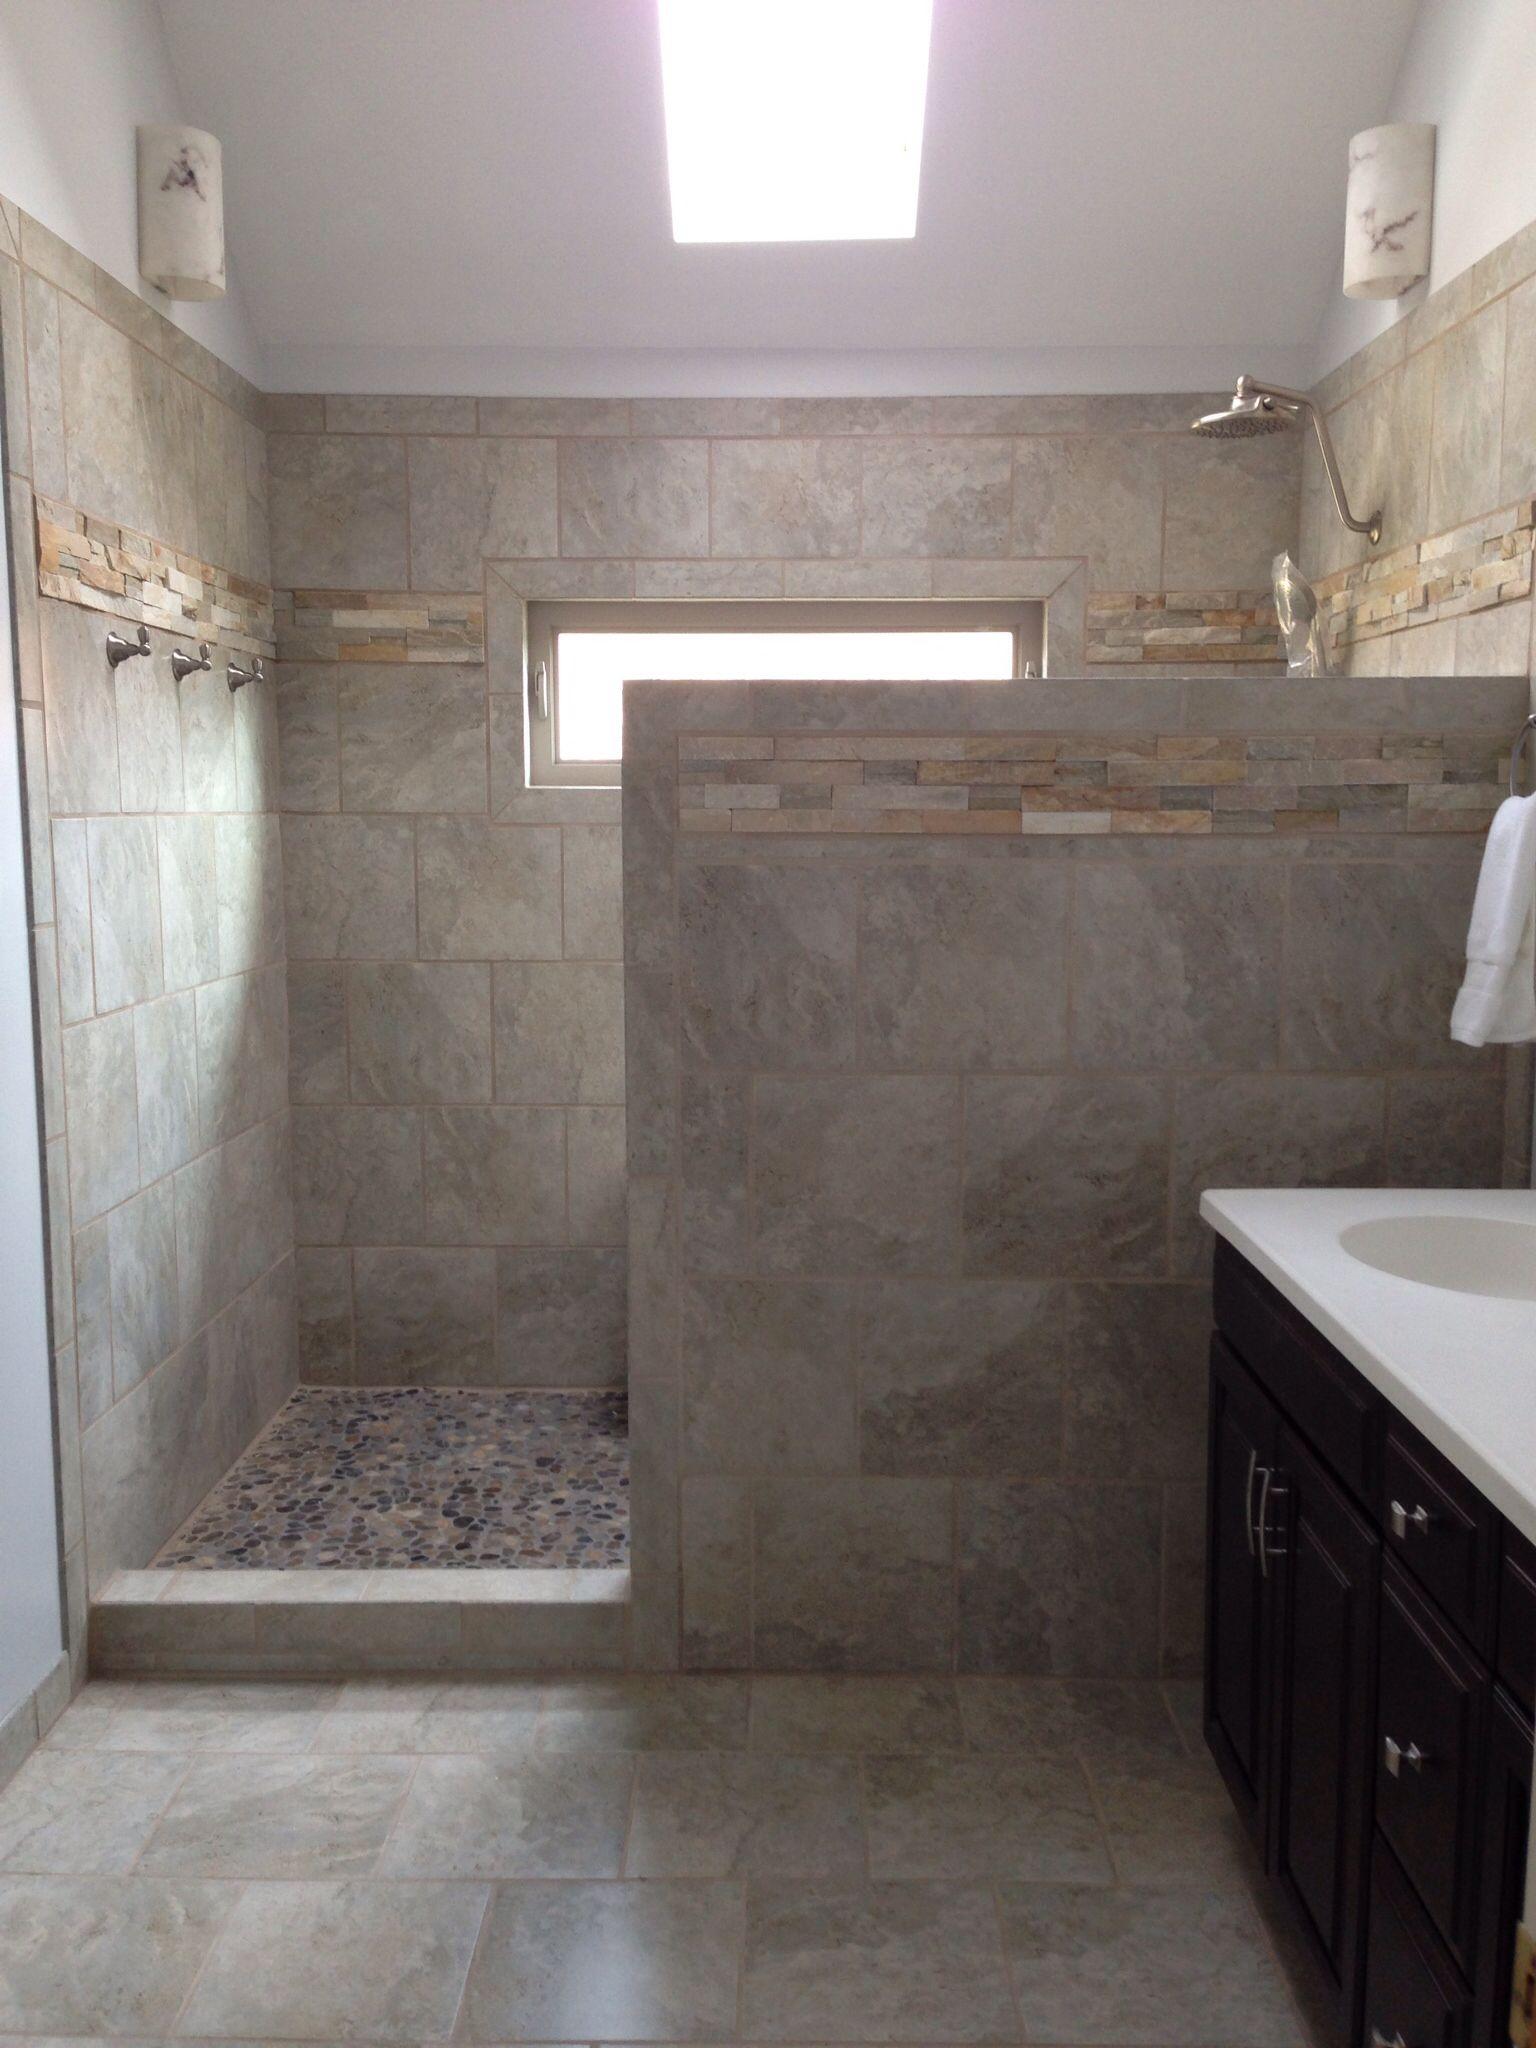 Shower Without Doors Bathroom Remodel Master Master Bathroom